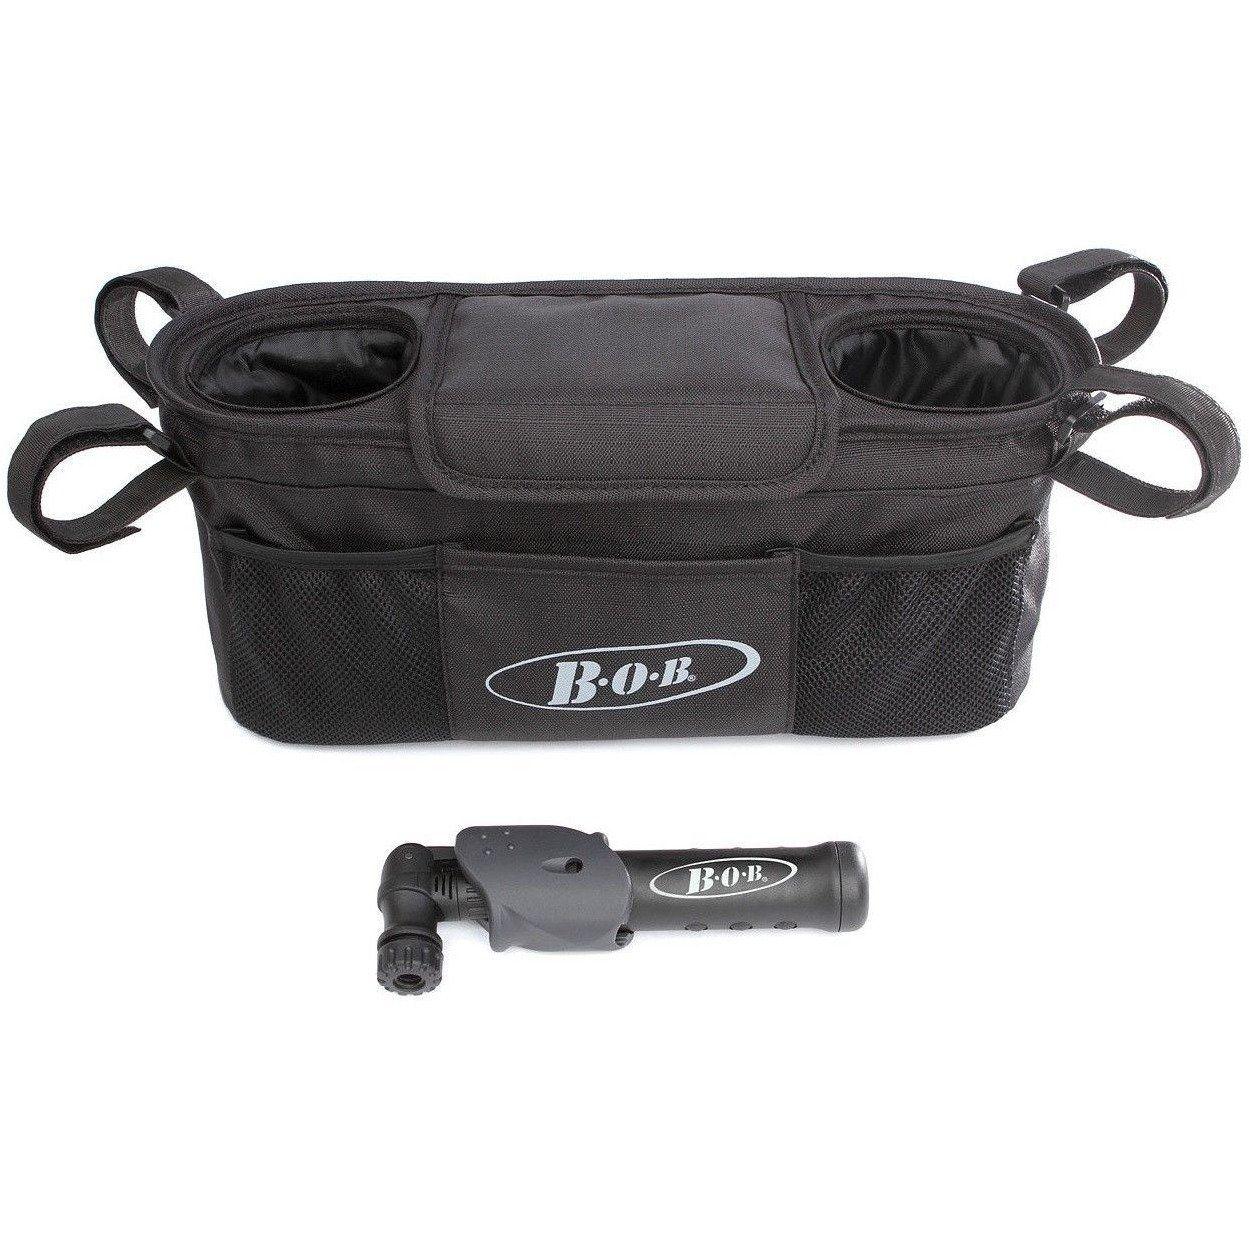 BOB Single Stroller Handlebar Console with Pump Accessory